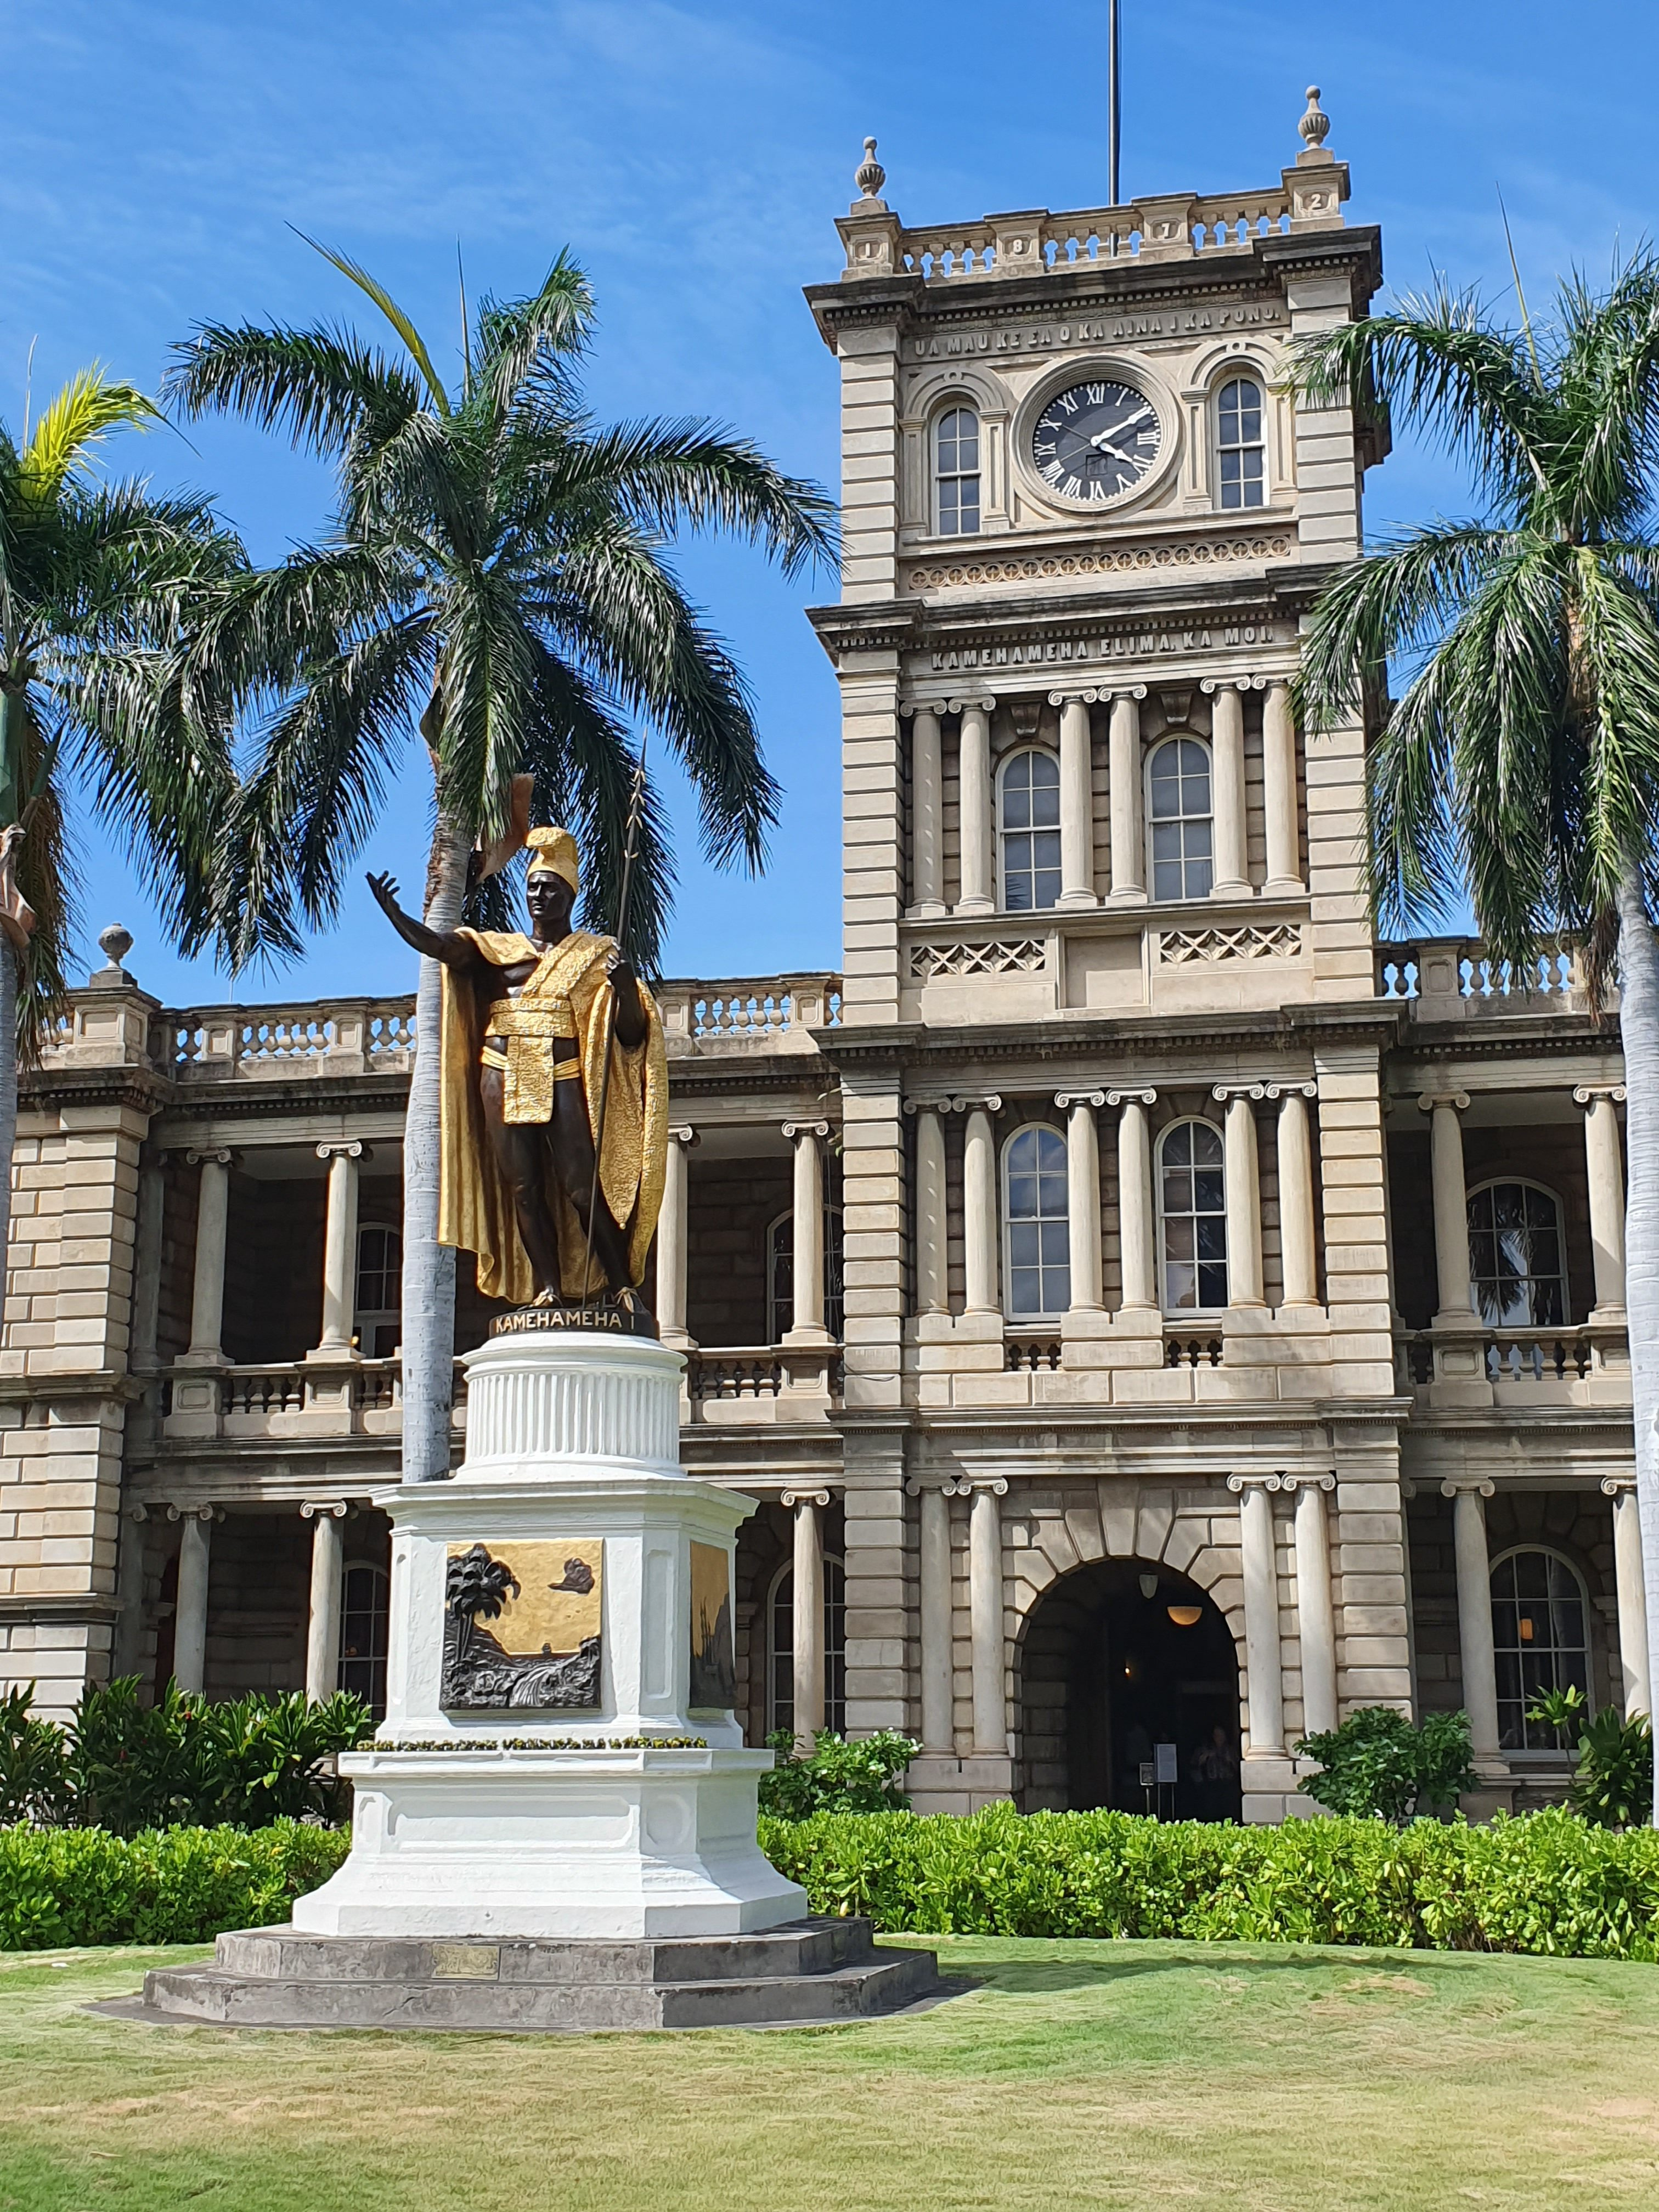 Iolani Palace and King Kamehameha StatueIolani Palace and King Kamehameha Statue